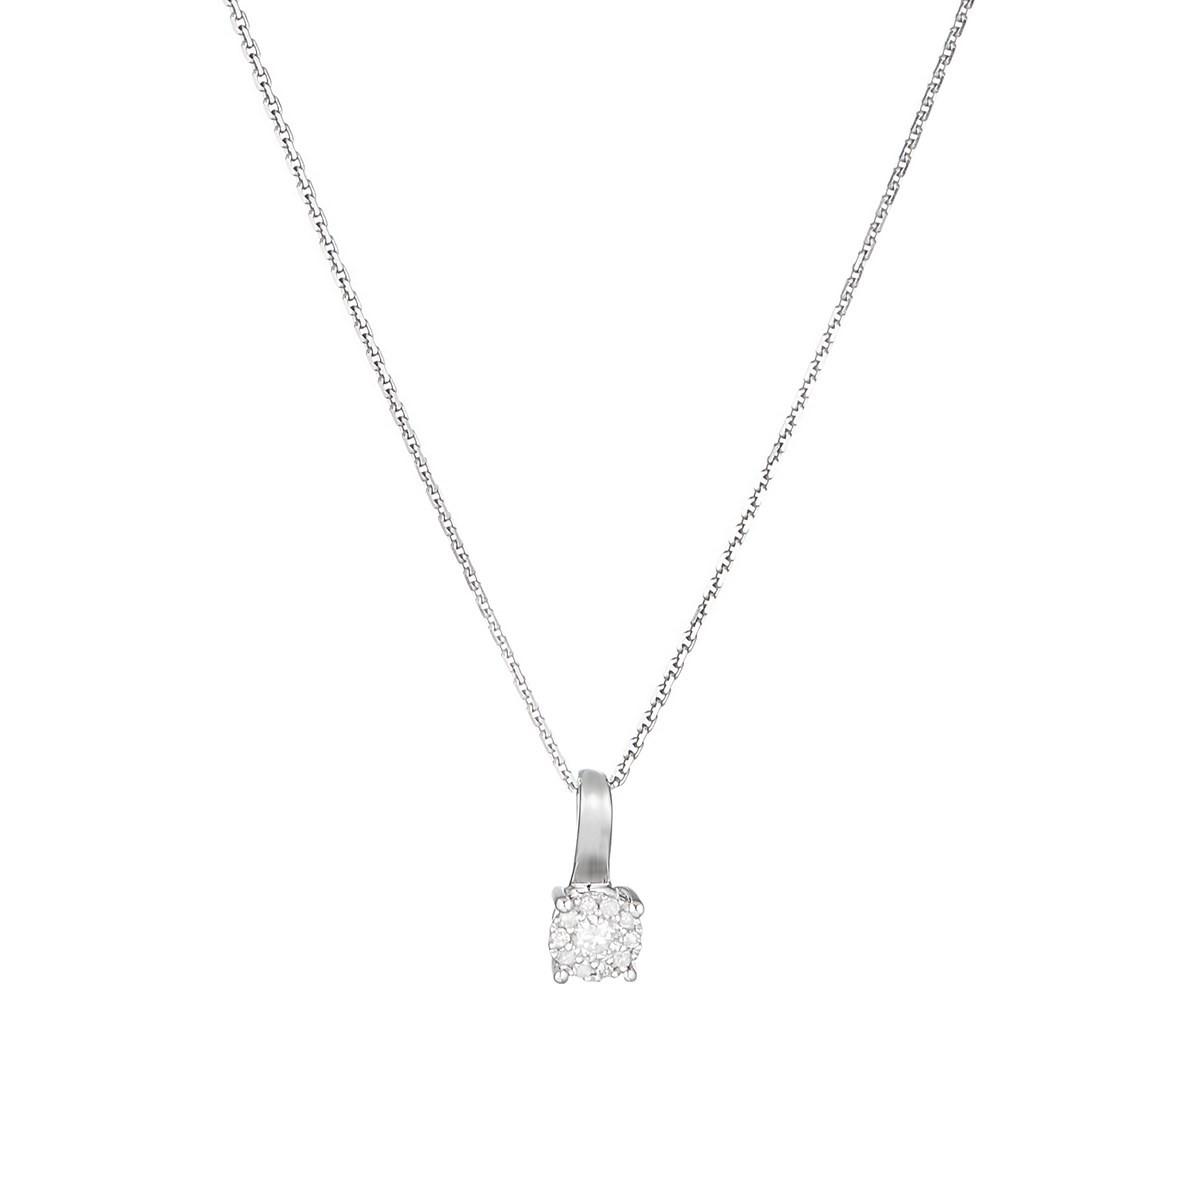 "Pendentif Or Blanc ""AKNA"" Diamants 0,11 carat + chaîne argent offerte"